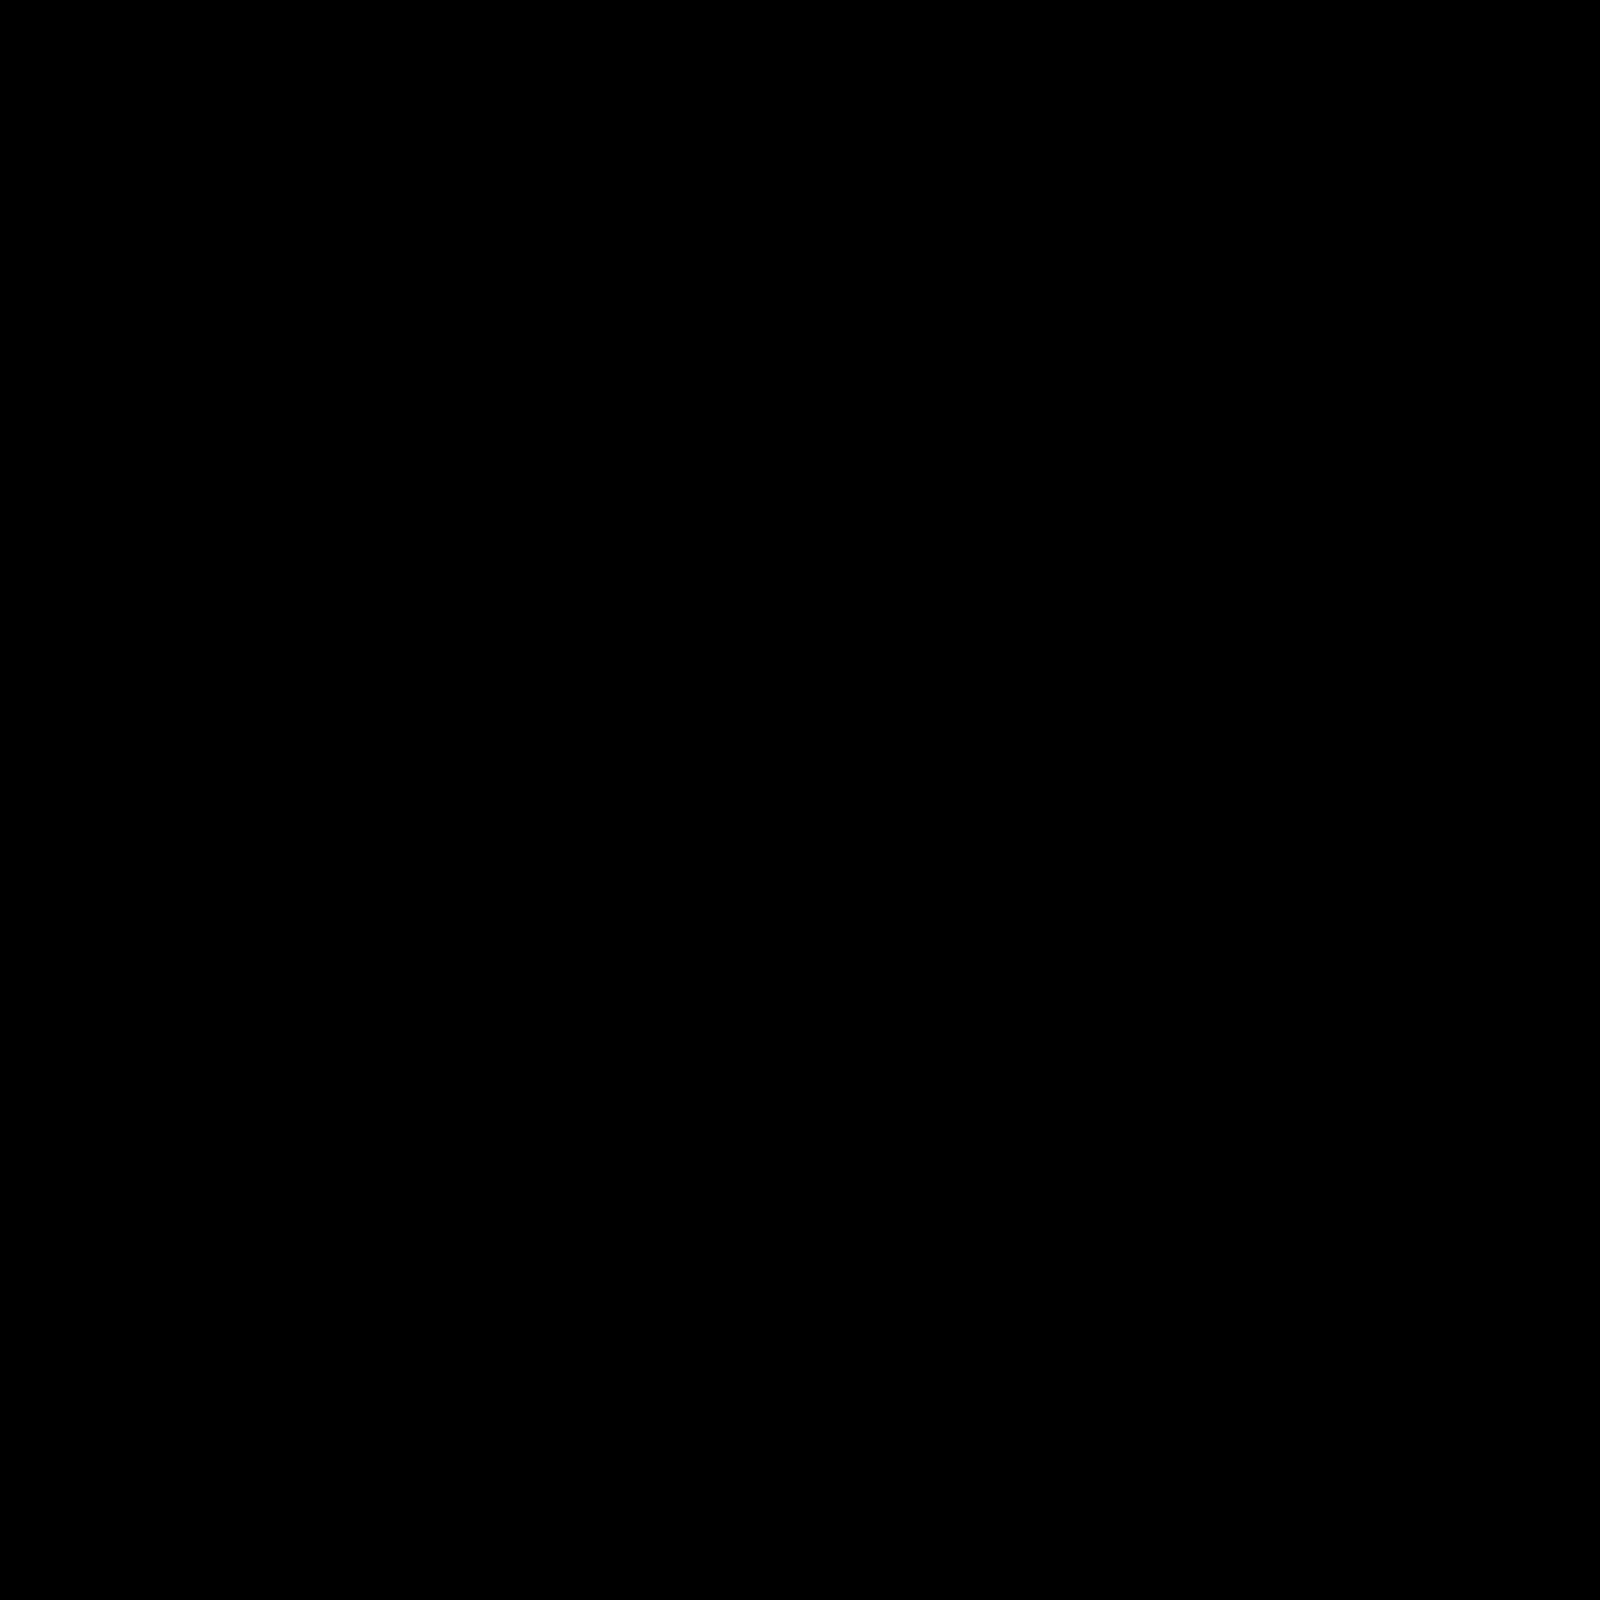 1 (One) CRISTAL D'ARQUES VENISE SAPHIR COURVOISIER Crystal Brandy Snifter image 4